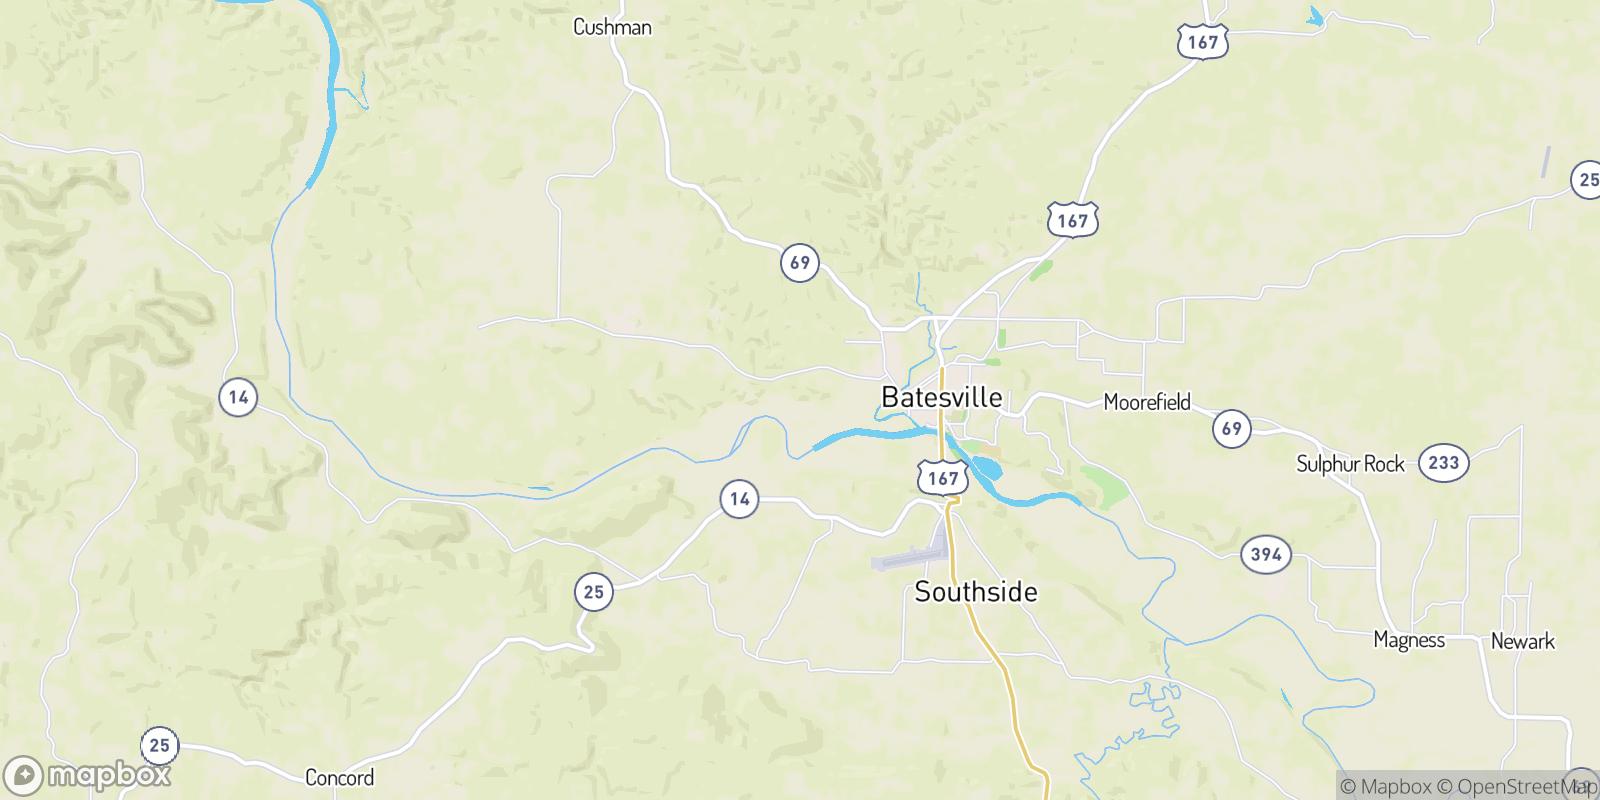 The best camping near Cushman Junction, Arkansas